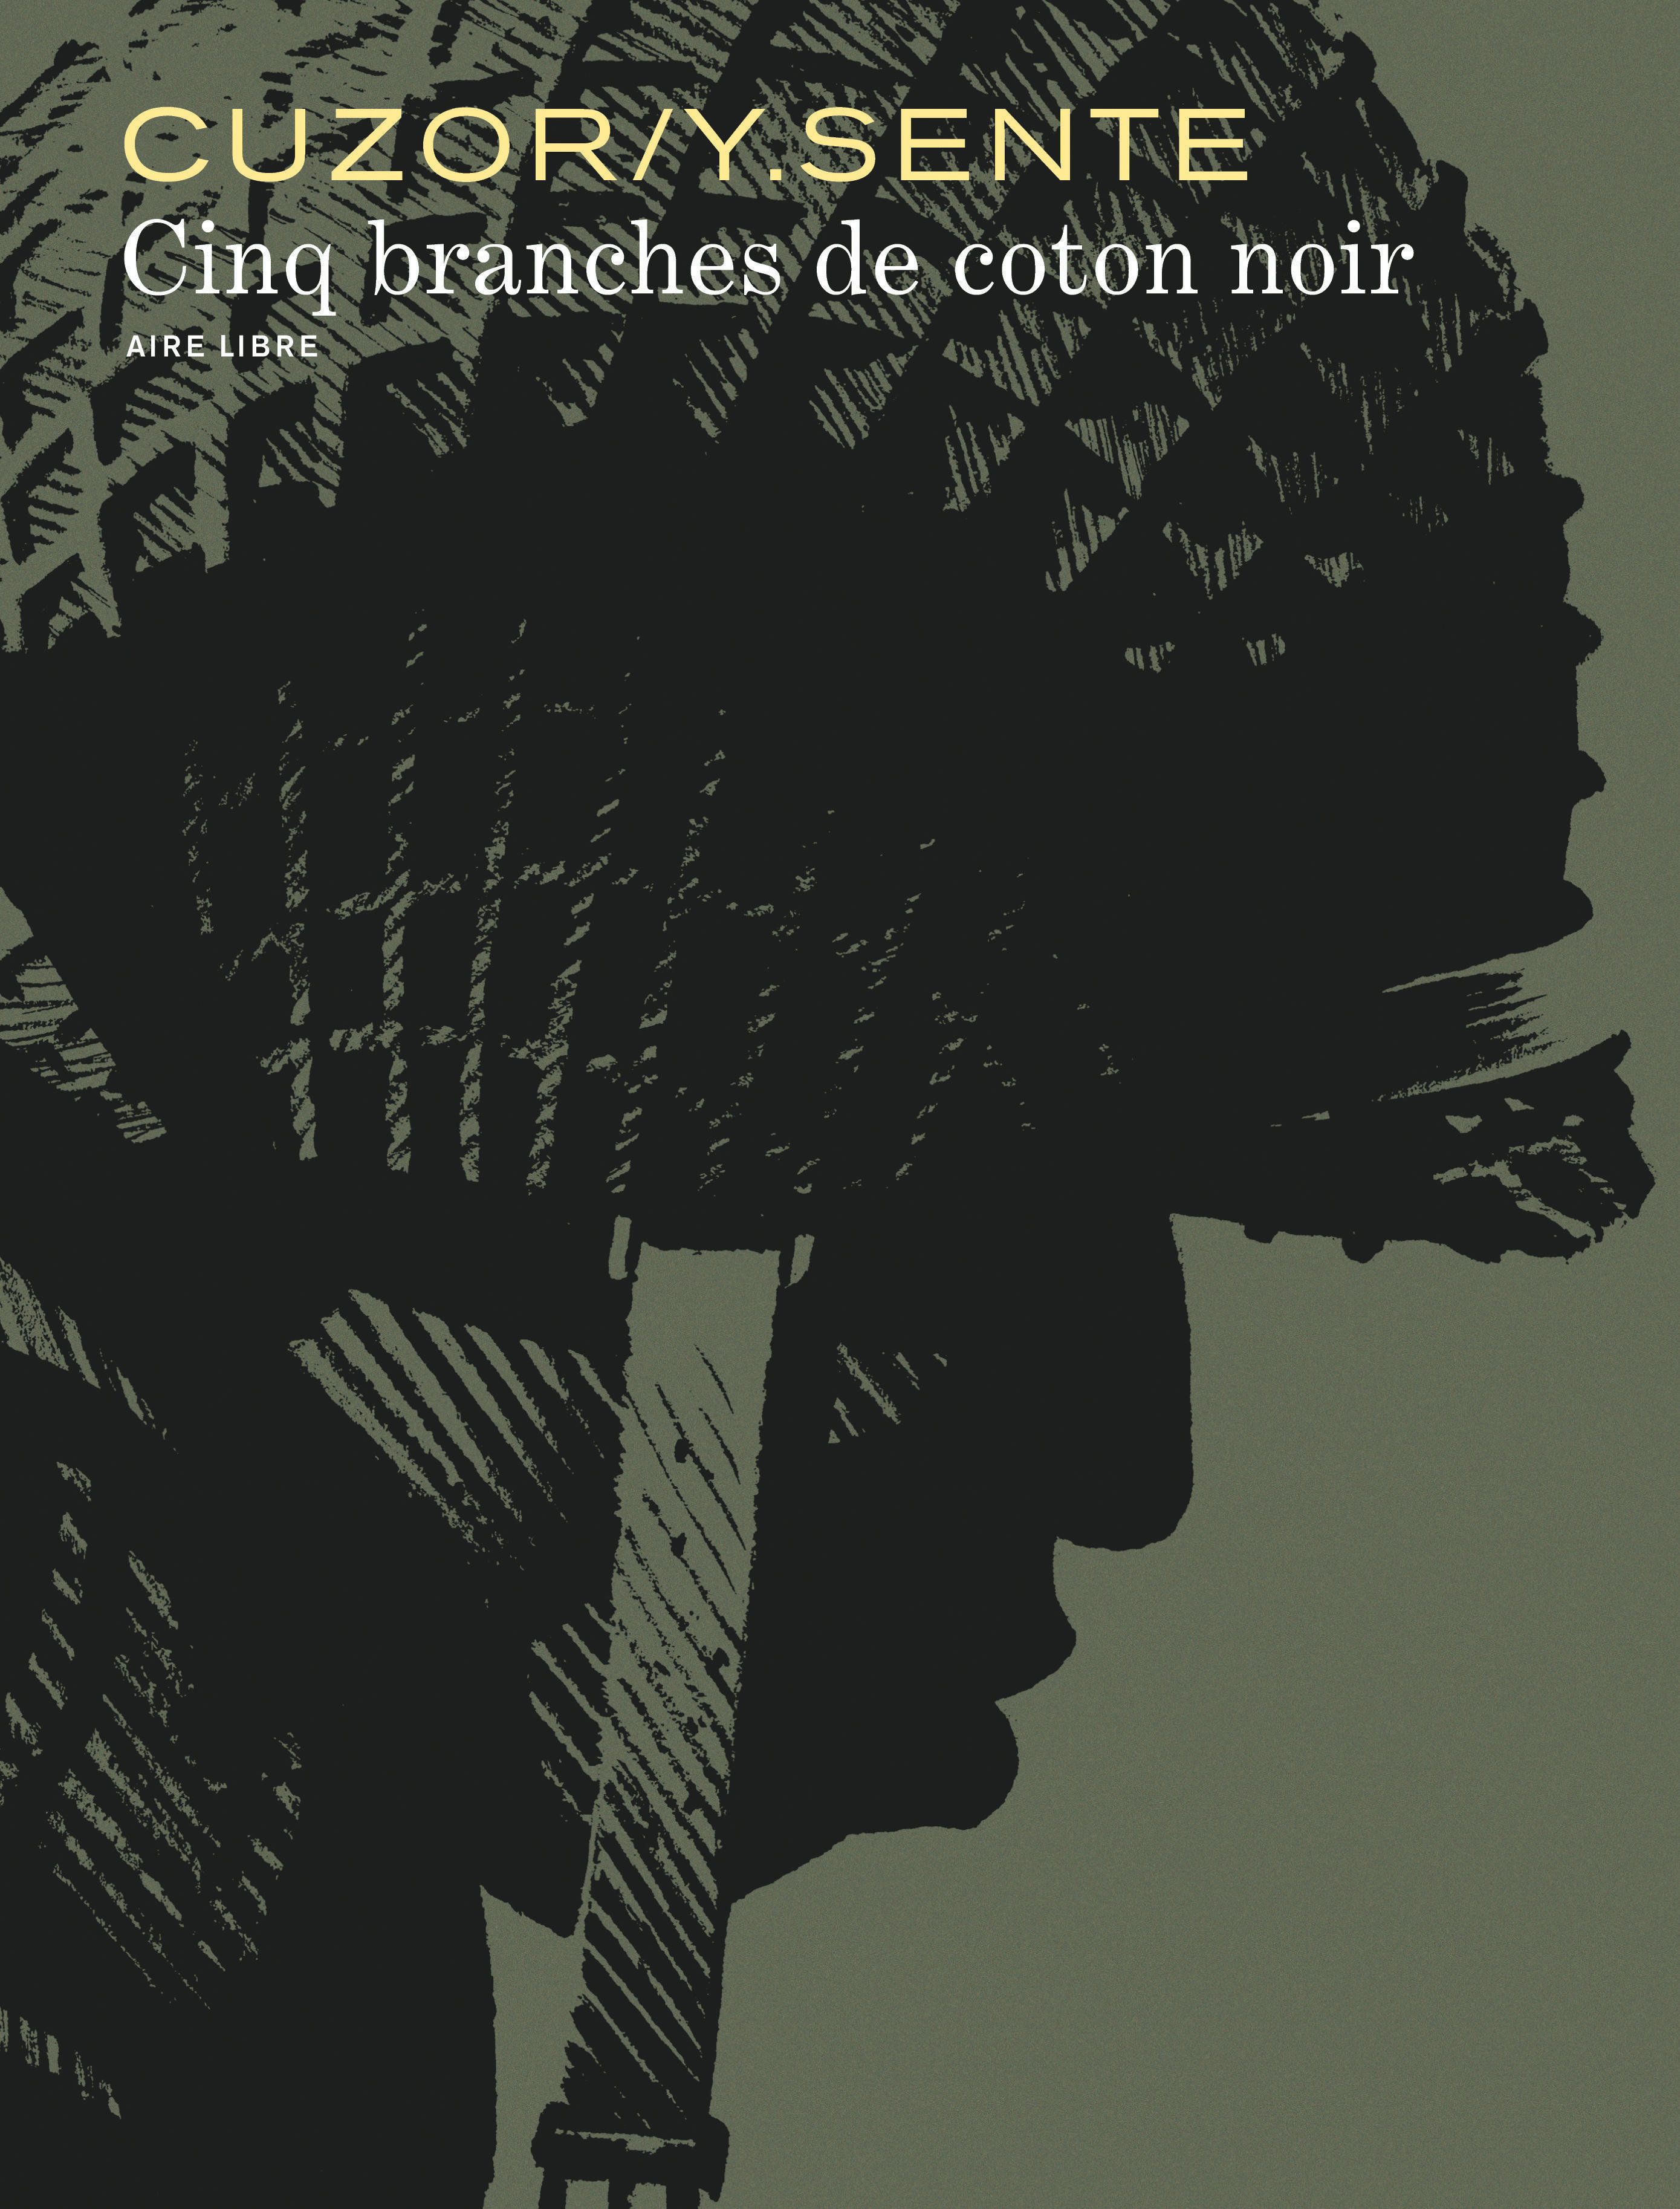 CINQ BRANCHES DE COTON NOIR CINQ BRANCHES DE COTON NOIR - TOME 0 - CINQ BRANCHES DE COTON NOIR